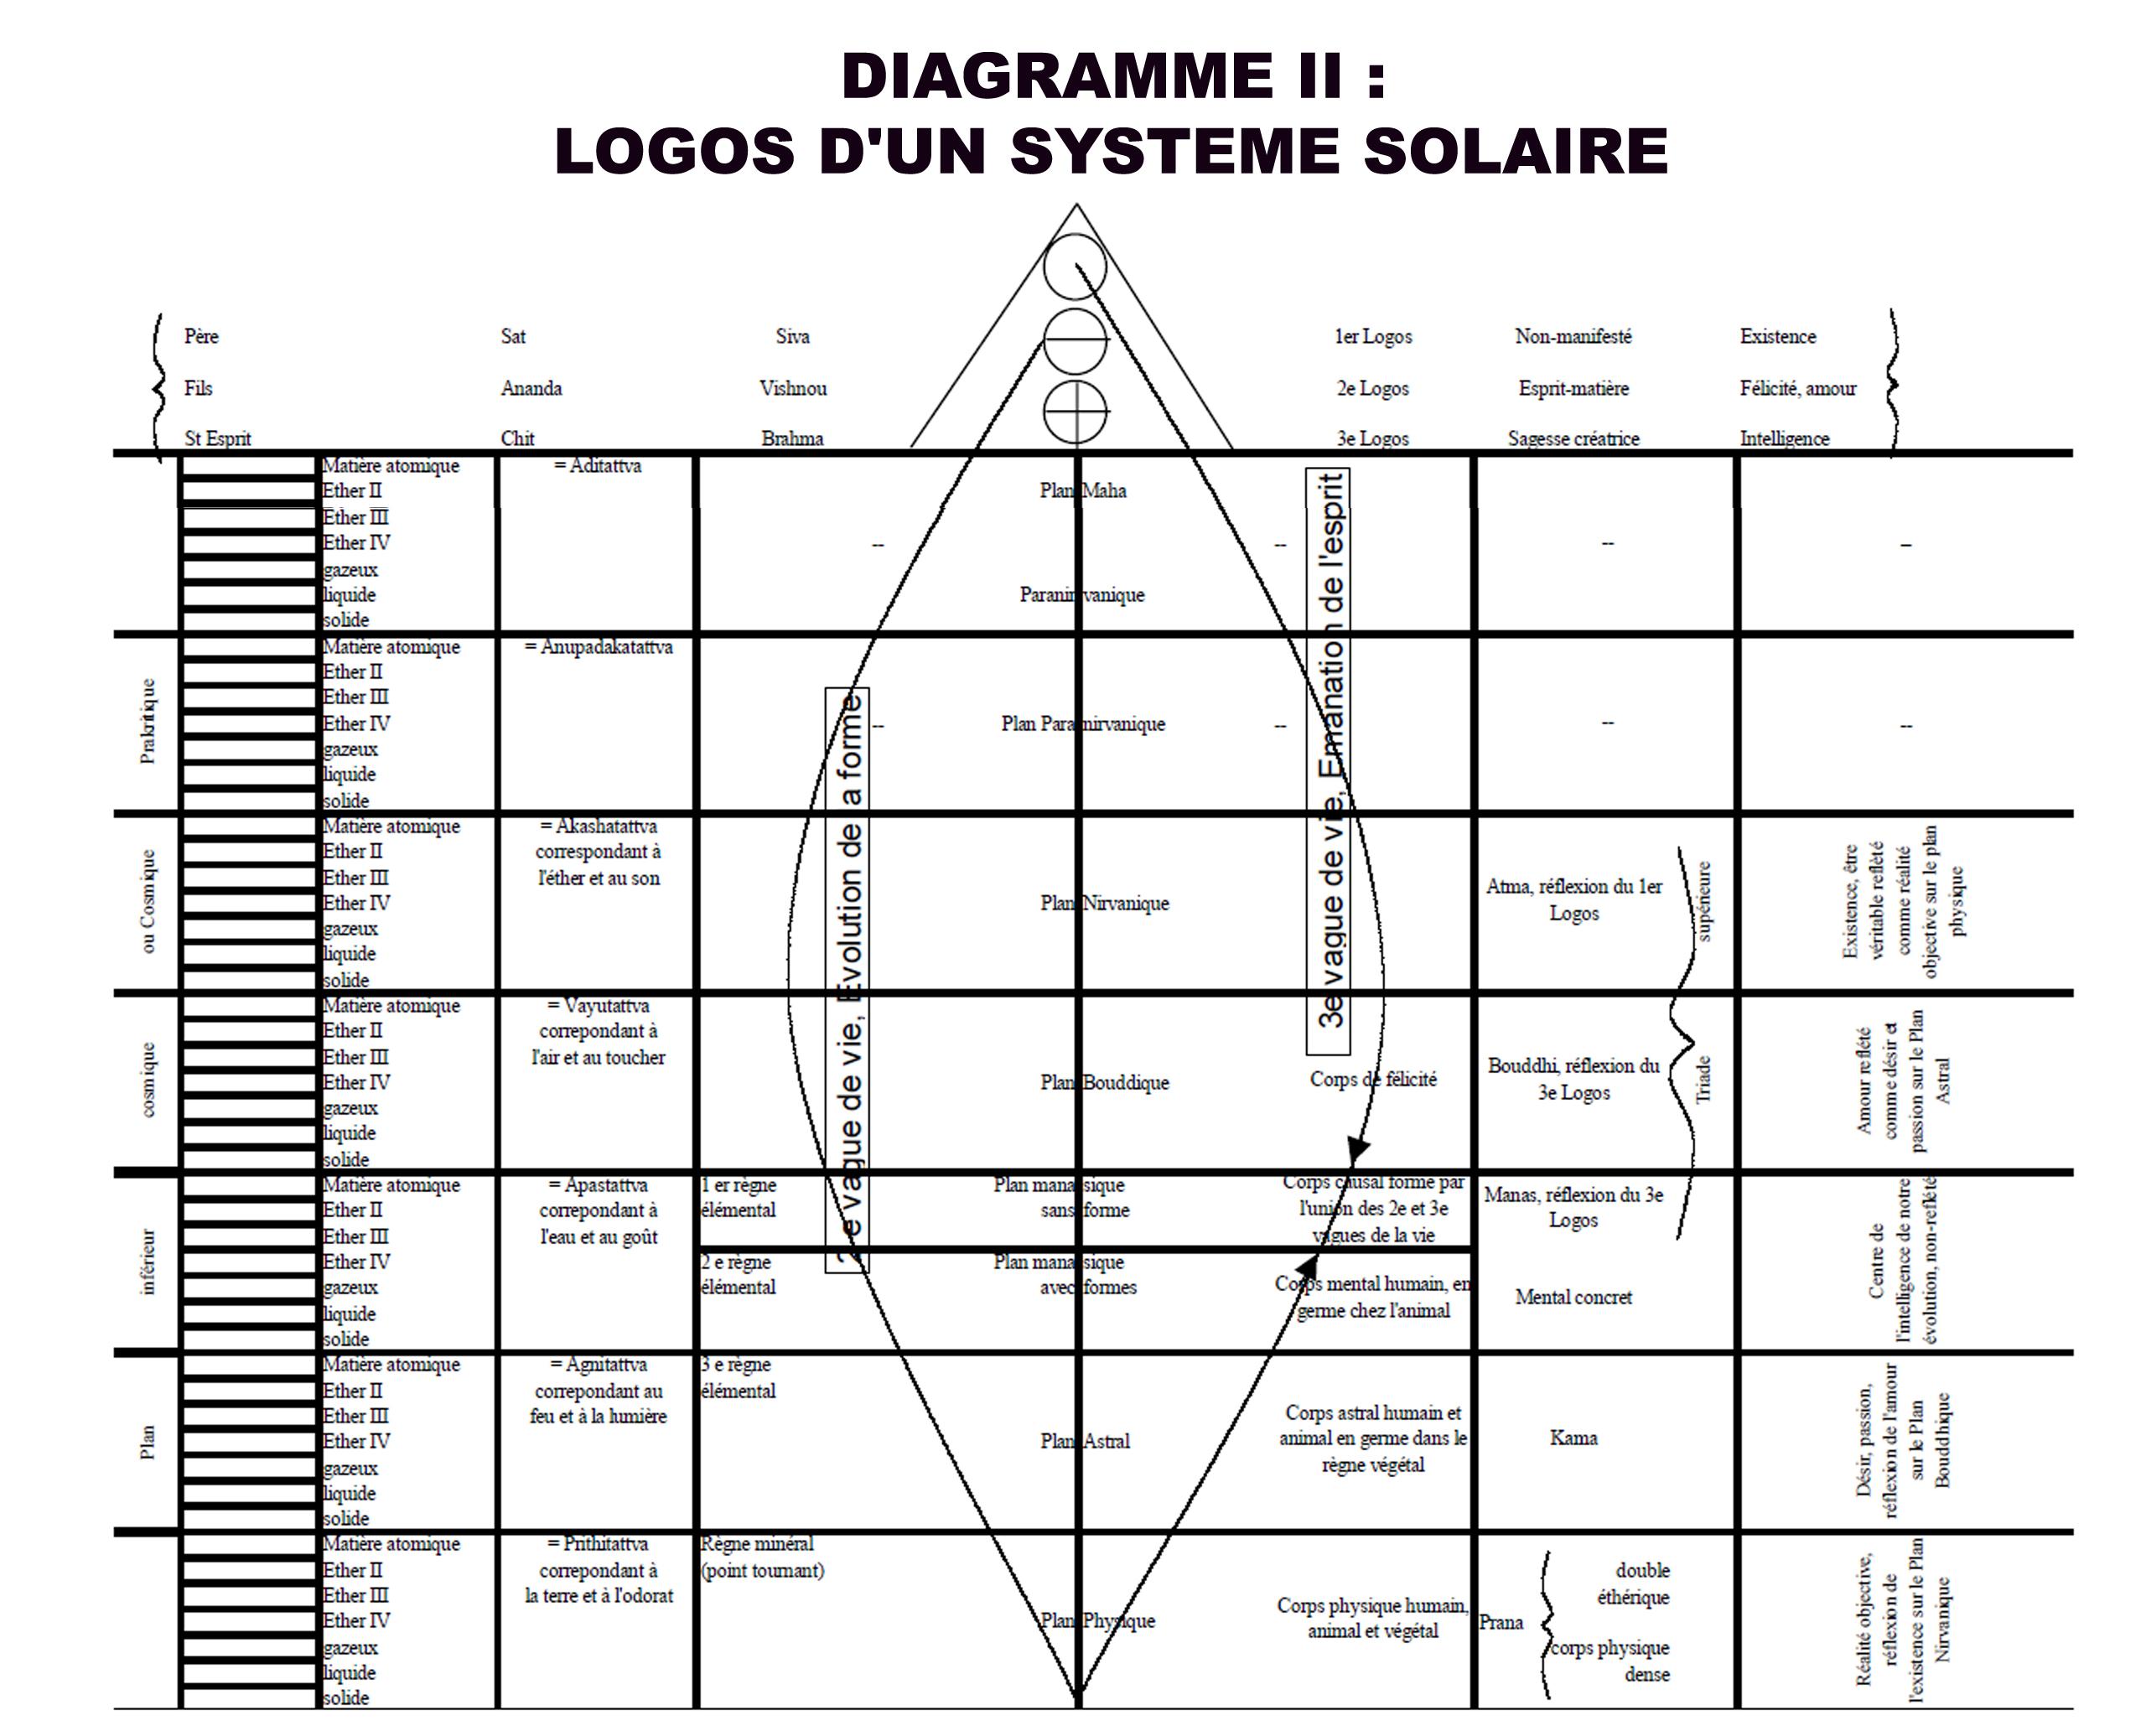 DIAGRAMME 2